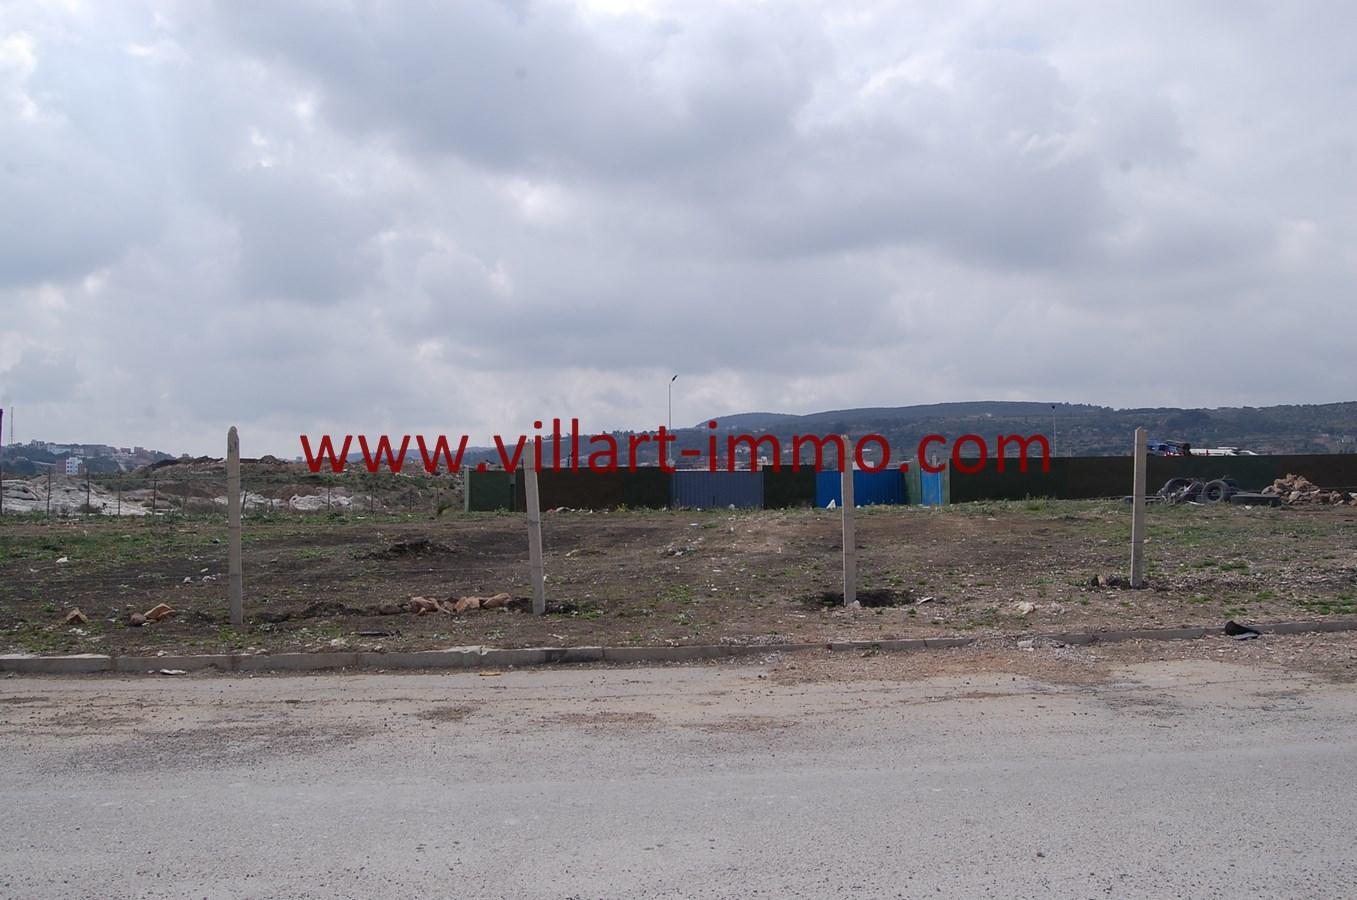 5-Vente-Terrain-Tanger-Gzenaya-VT27-Villart Immo